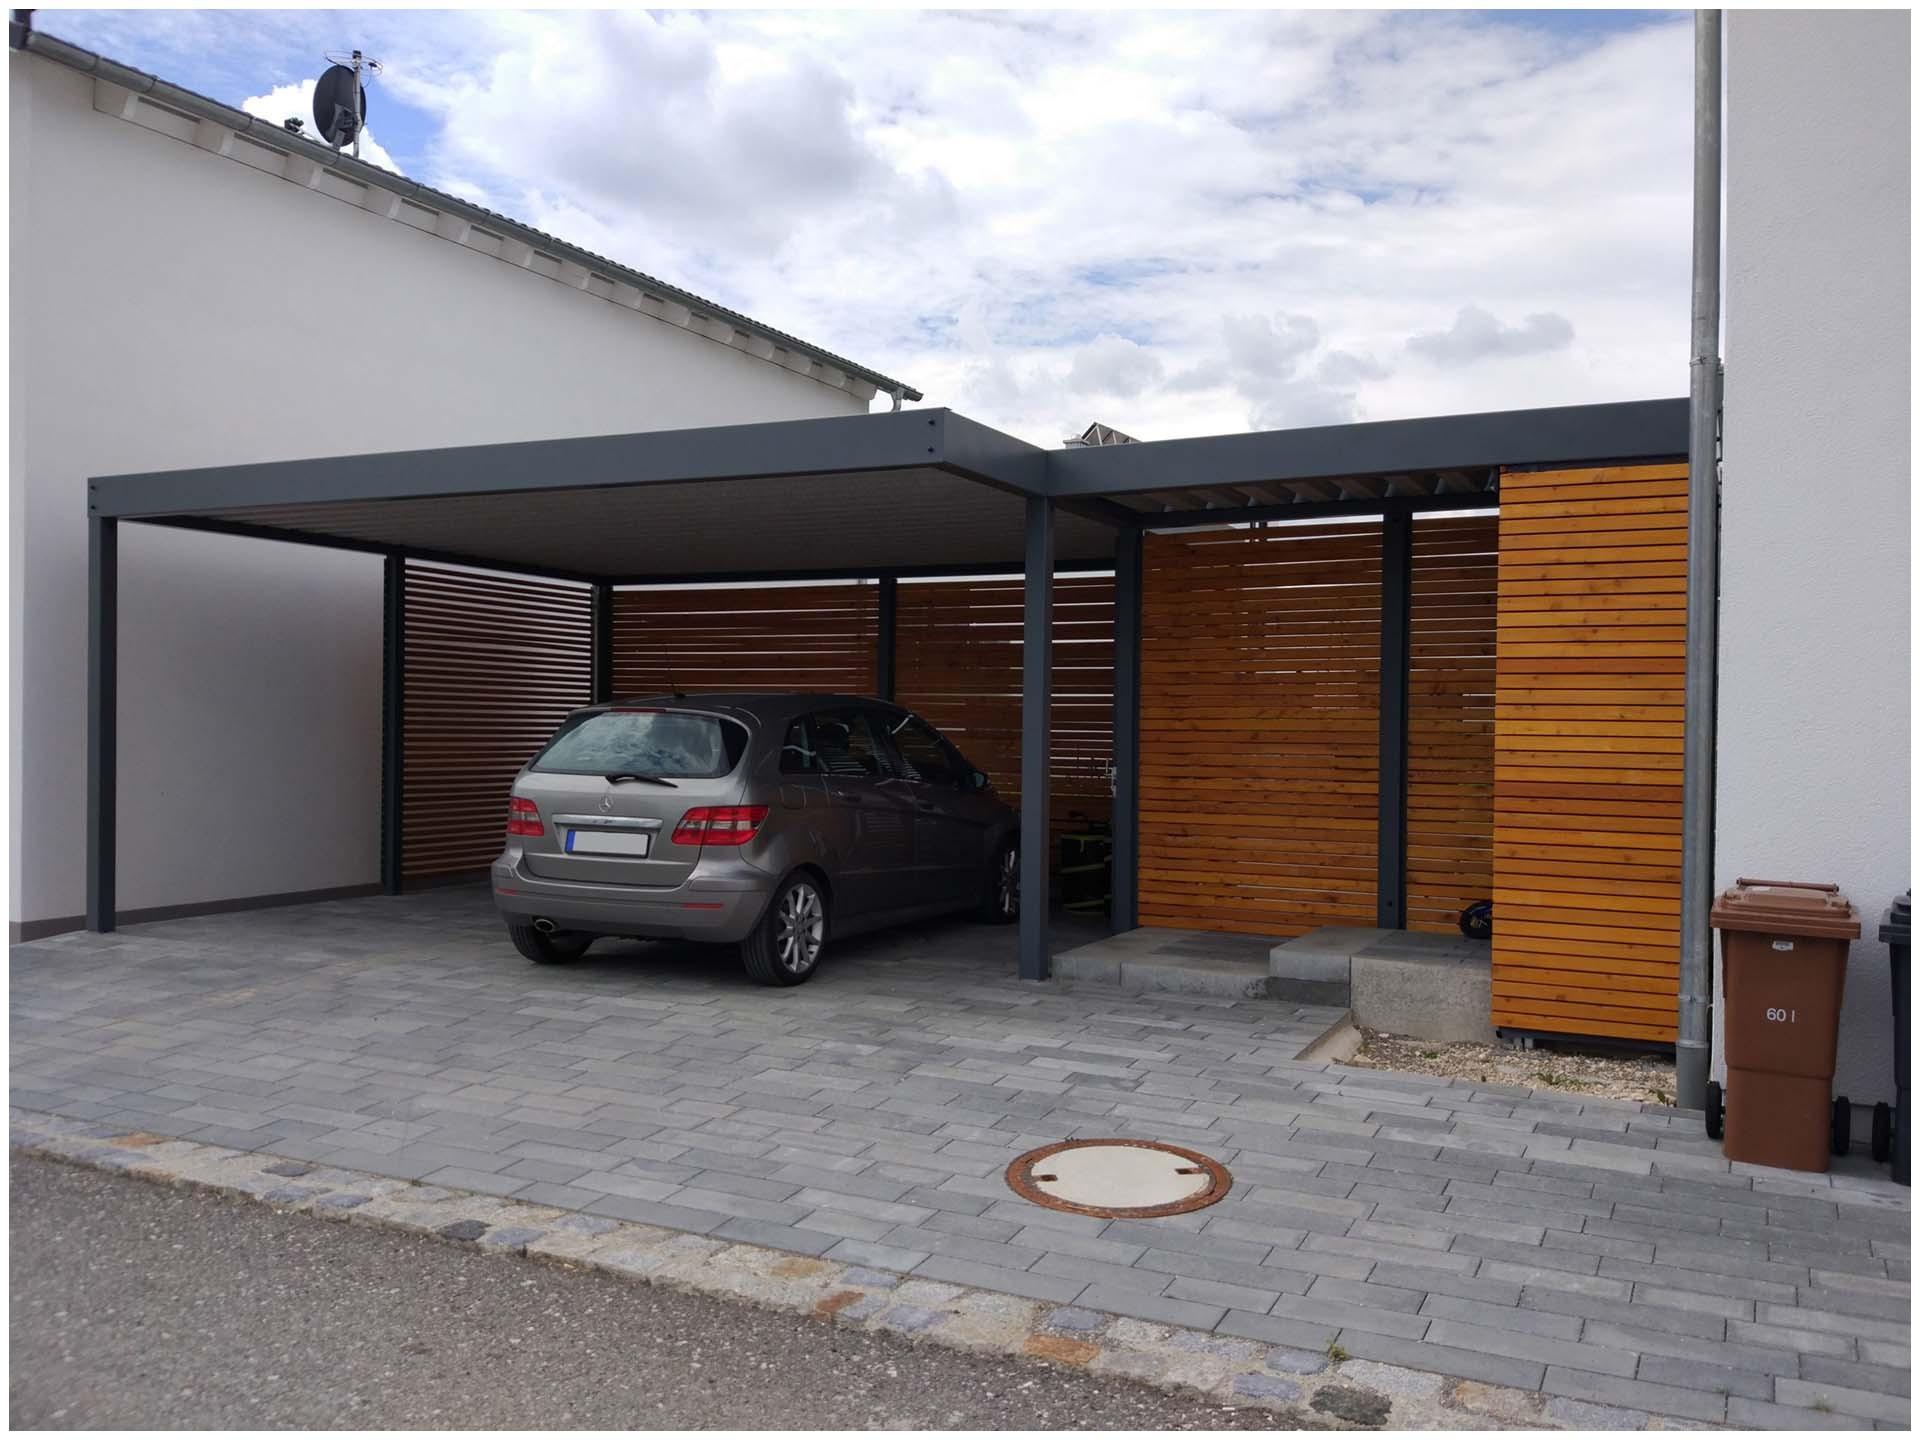 Garage Blech  Garage Blech Design Metall Carport Mit Vordach Aus